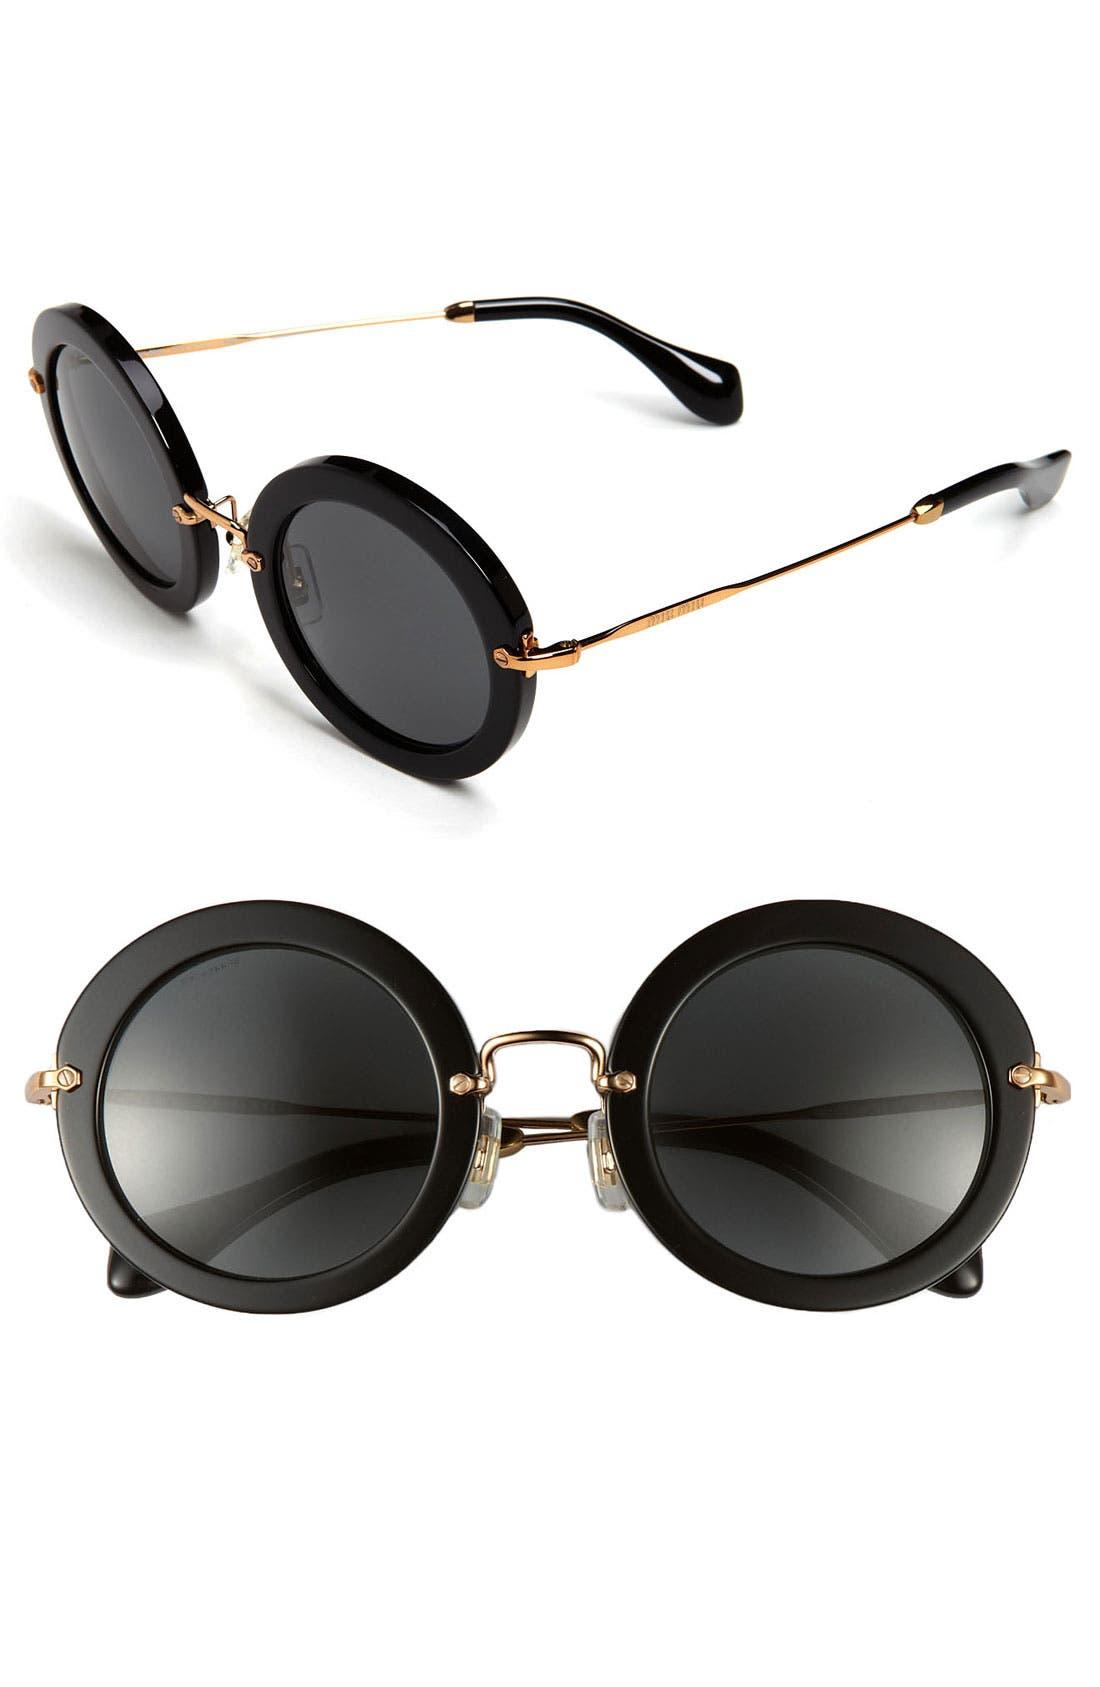 49mm Round Retro Sunglasses, Main, color, 001